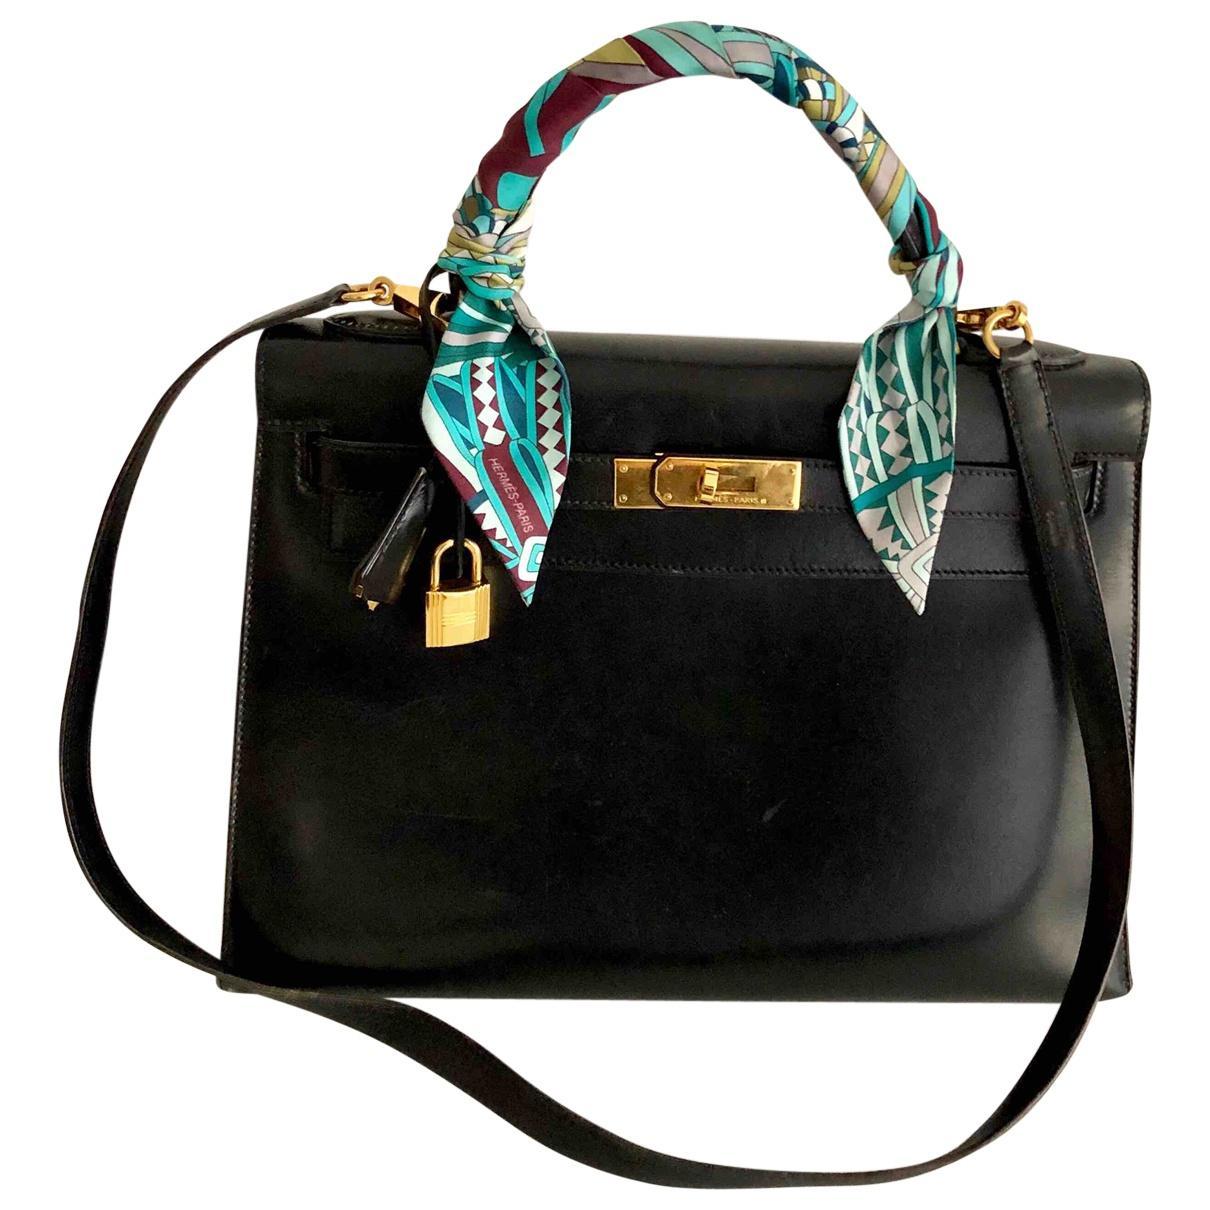 843b902bd0ba Lyst - Hermès Vintage Kelly 28 Black Leather Handbag in Black